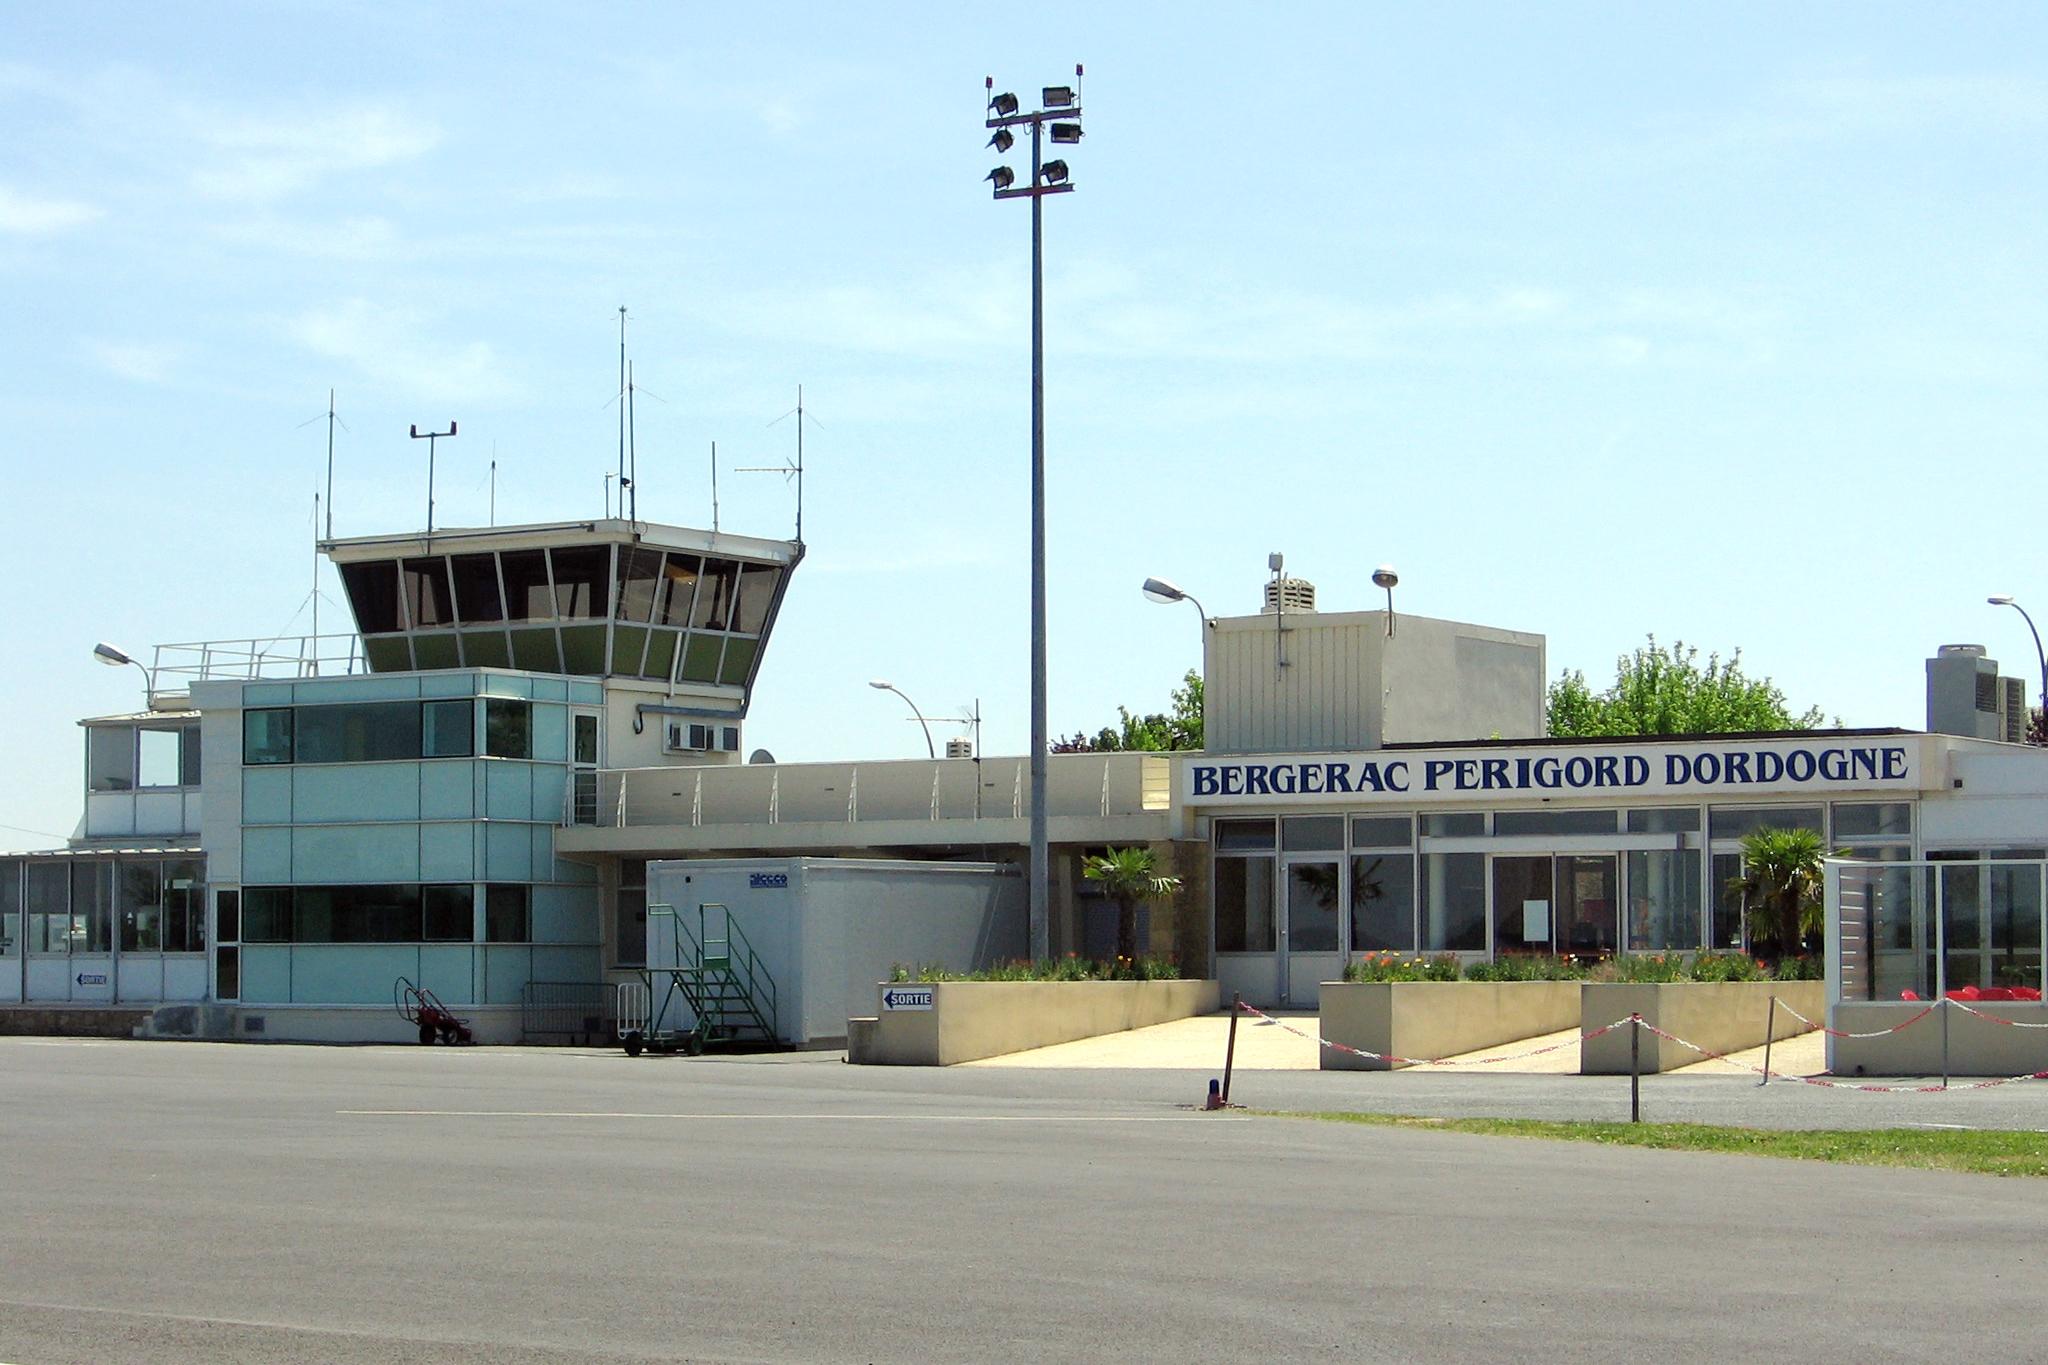 Aéroport de Bergerac-Dordogne-Périgord